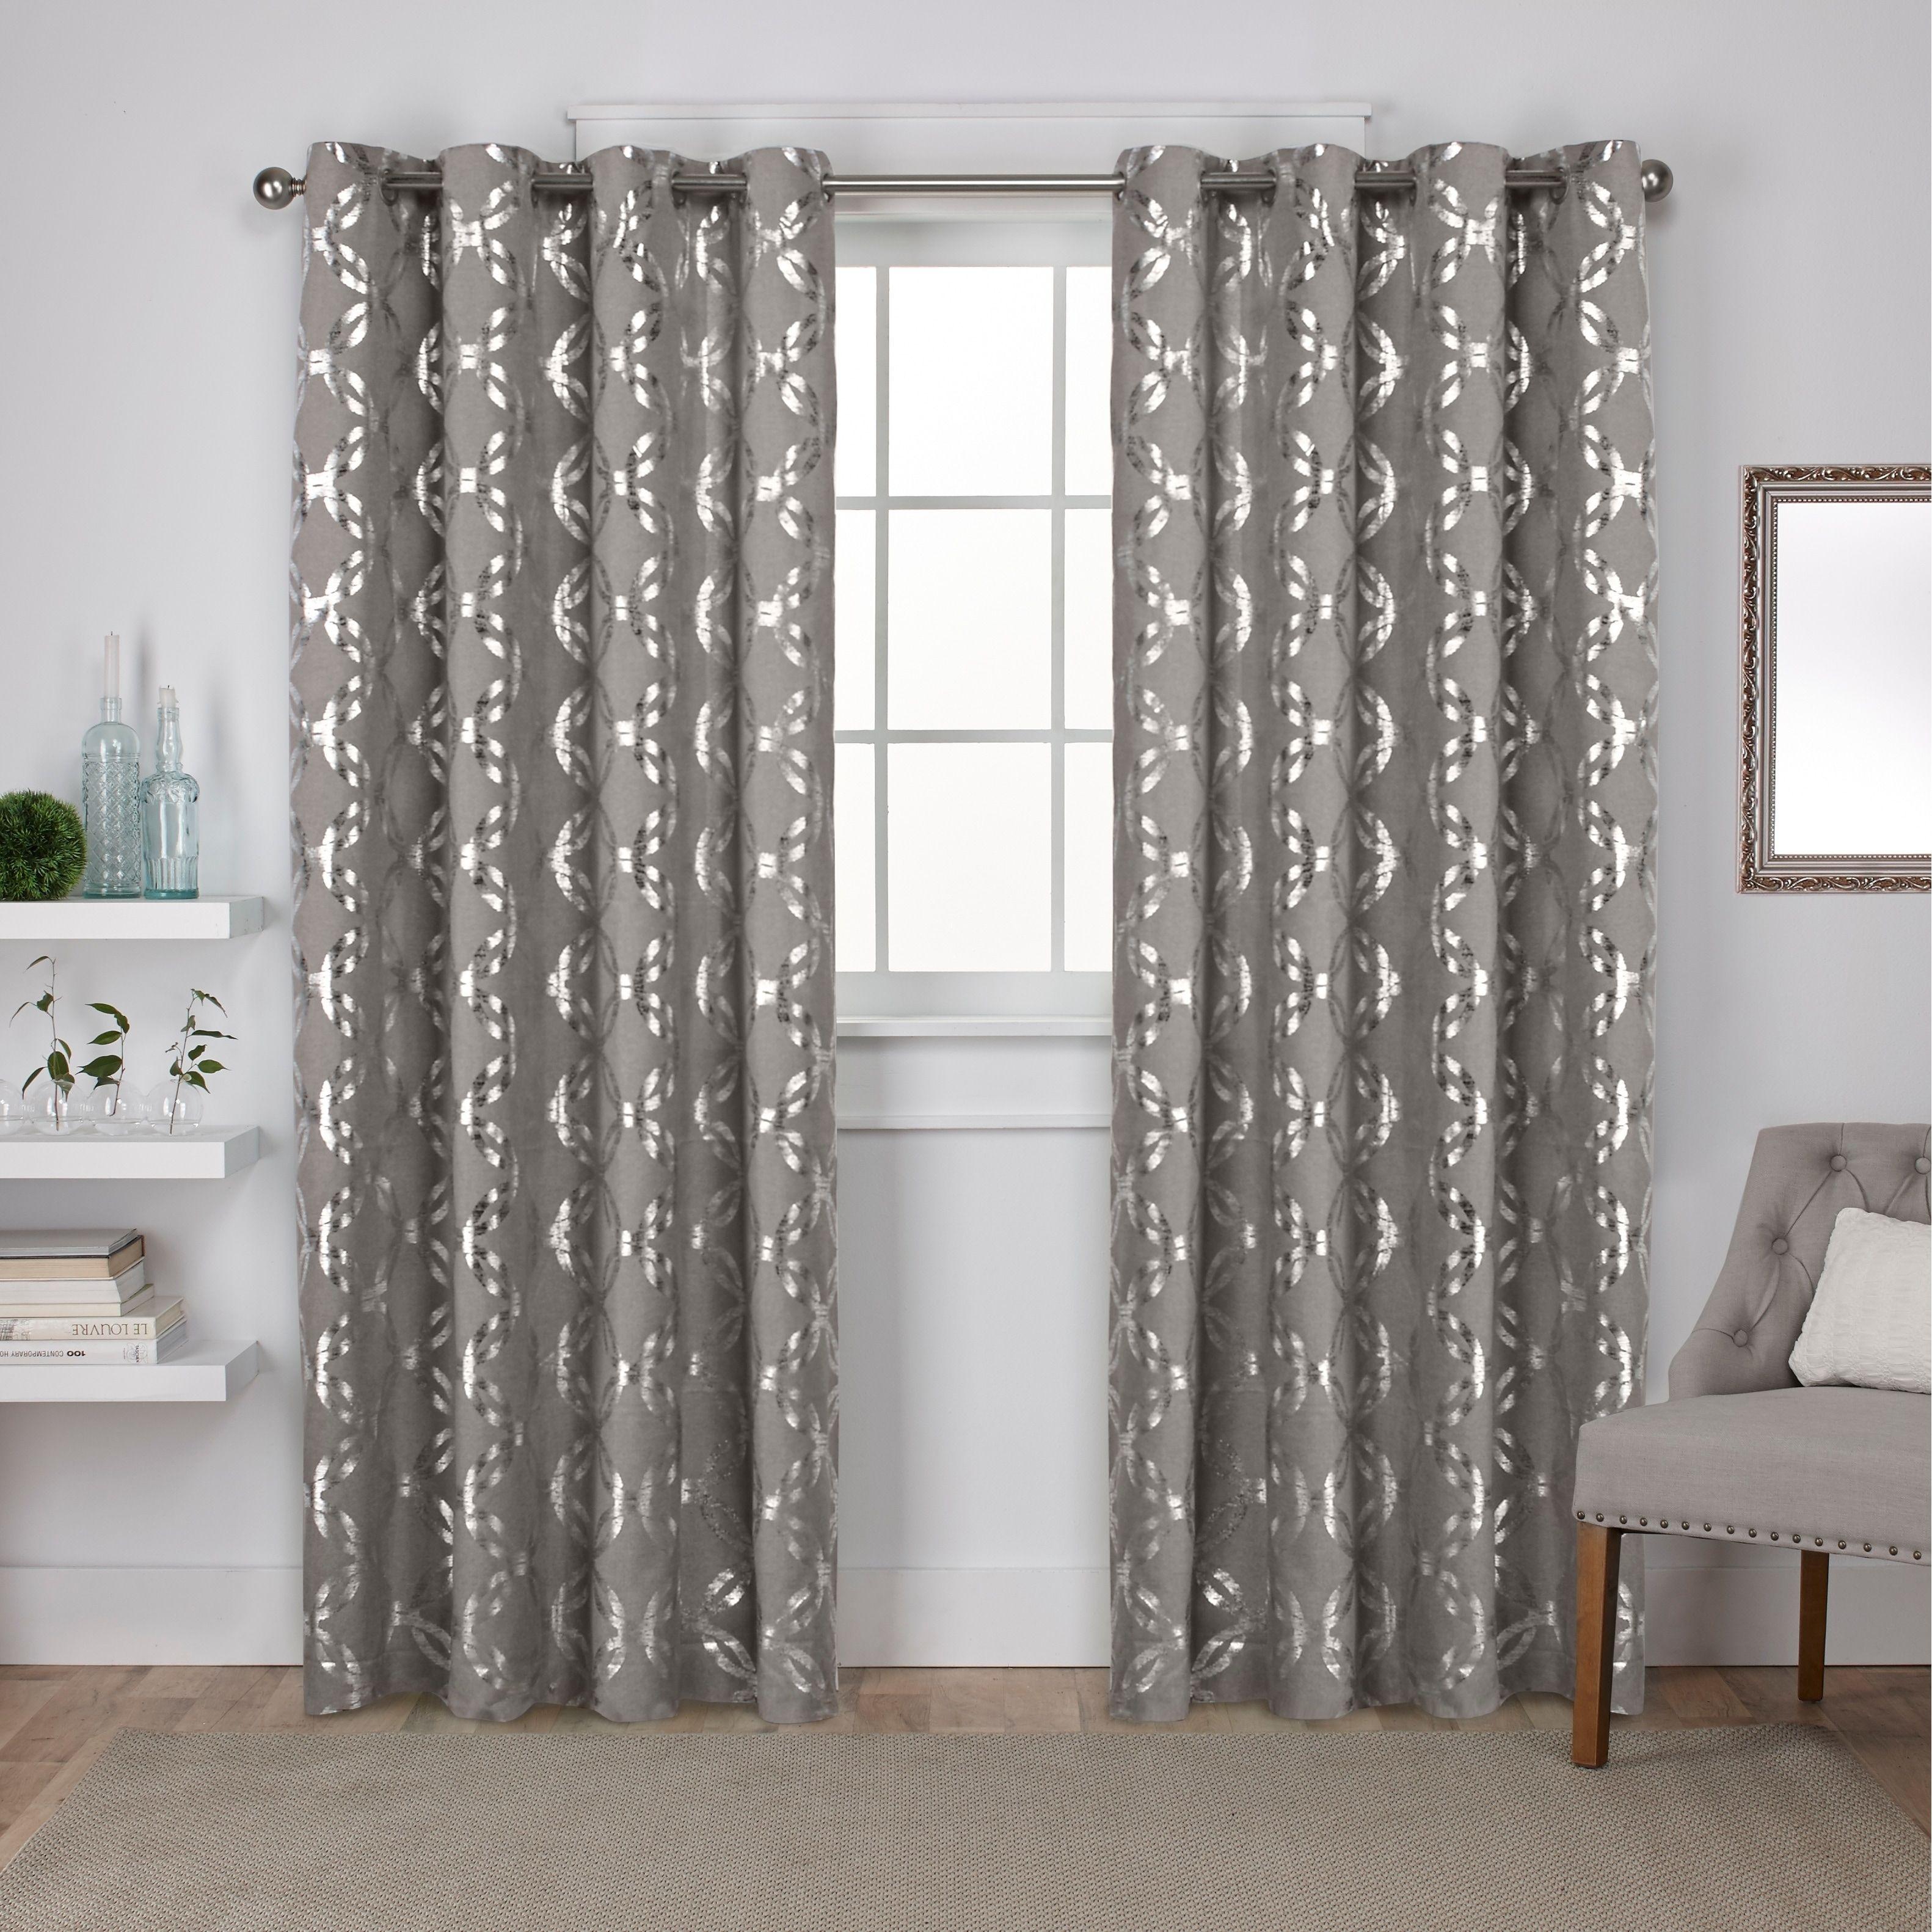 Ati Home Modo Metallic (grey) Geometric Curtain Panel Pair In Total Blackout Metallic Print Grommet Top Curtain Panels (View 11 of 36)